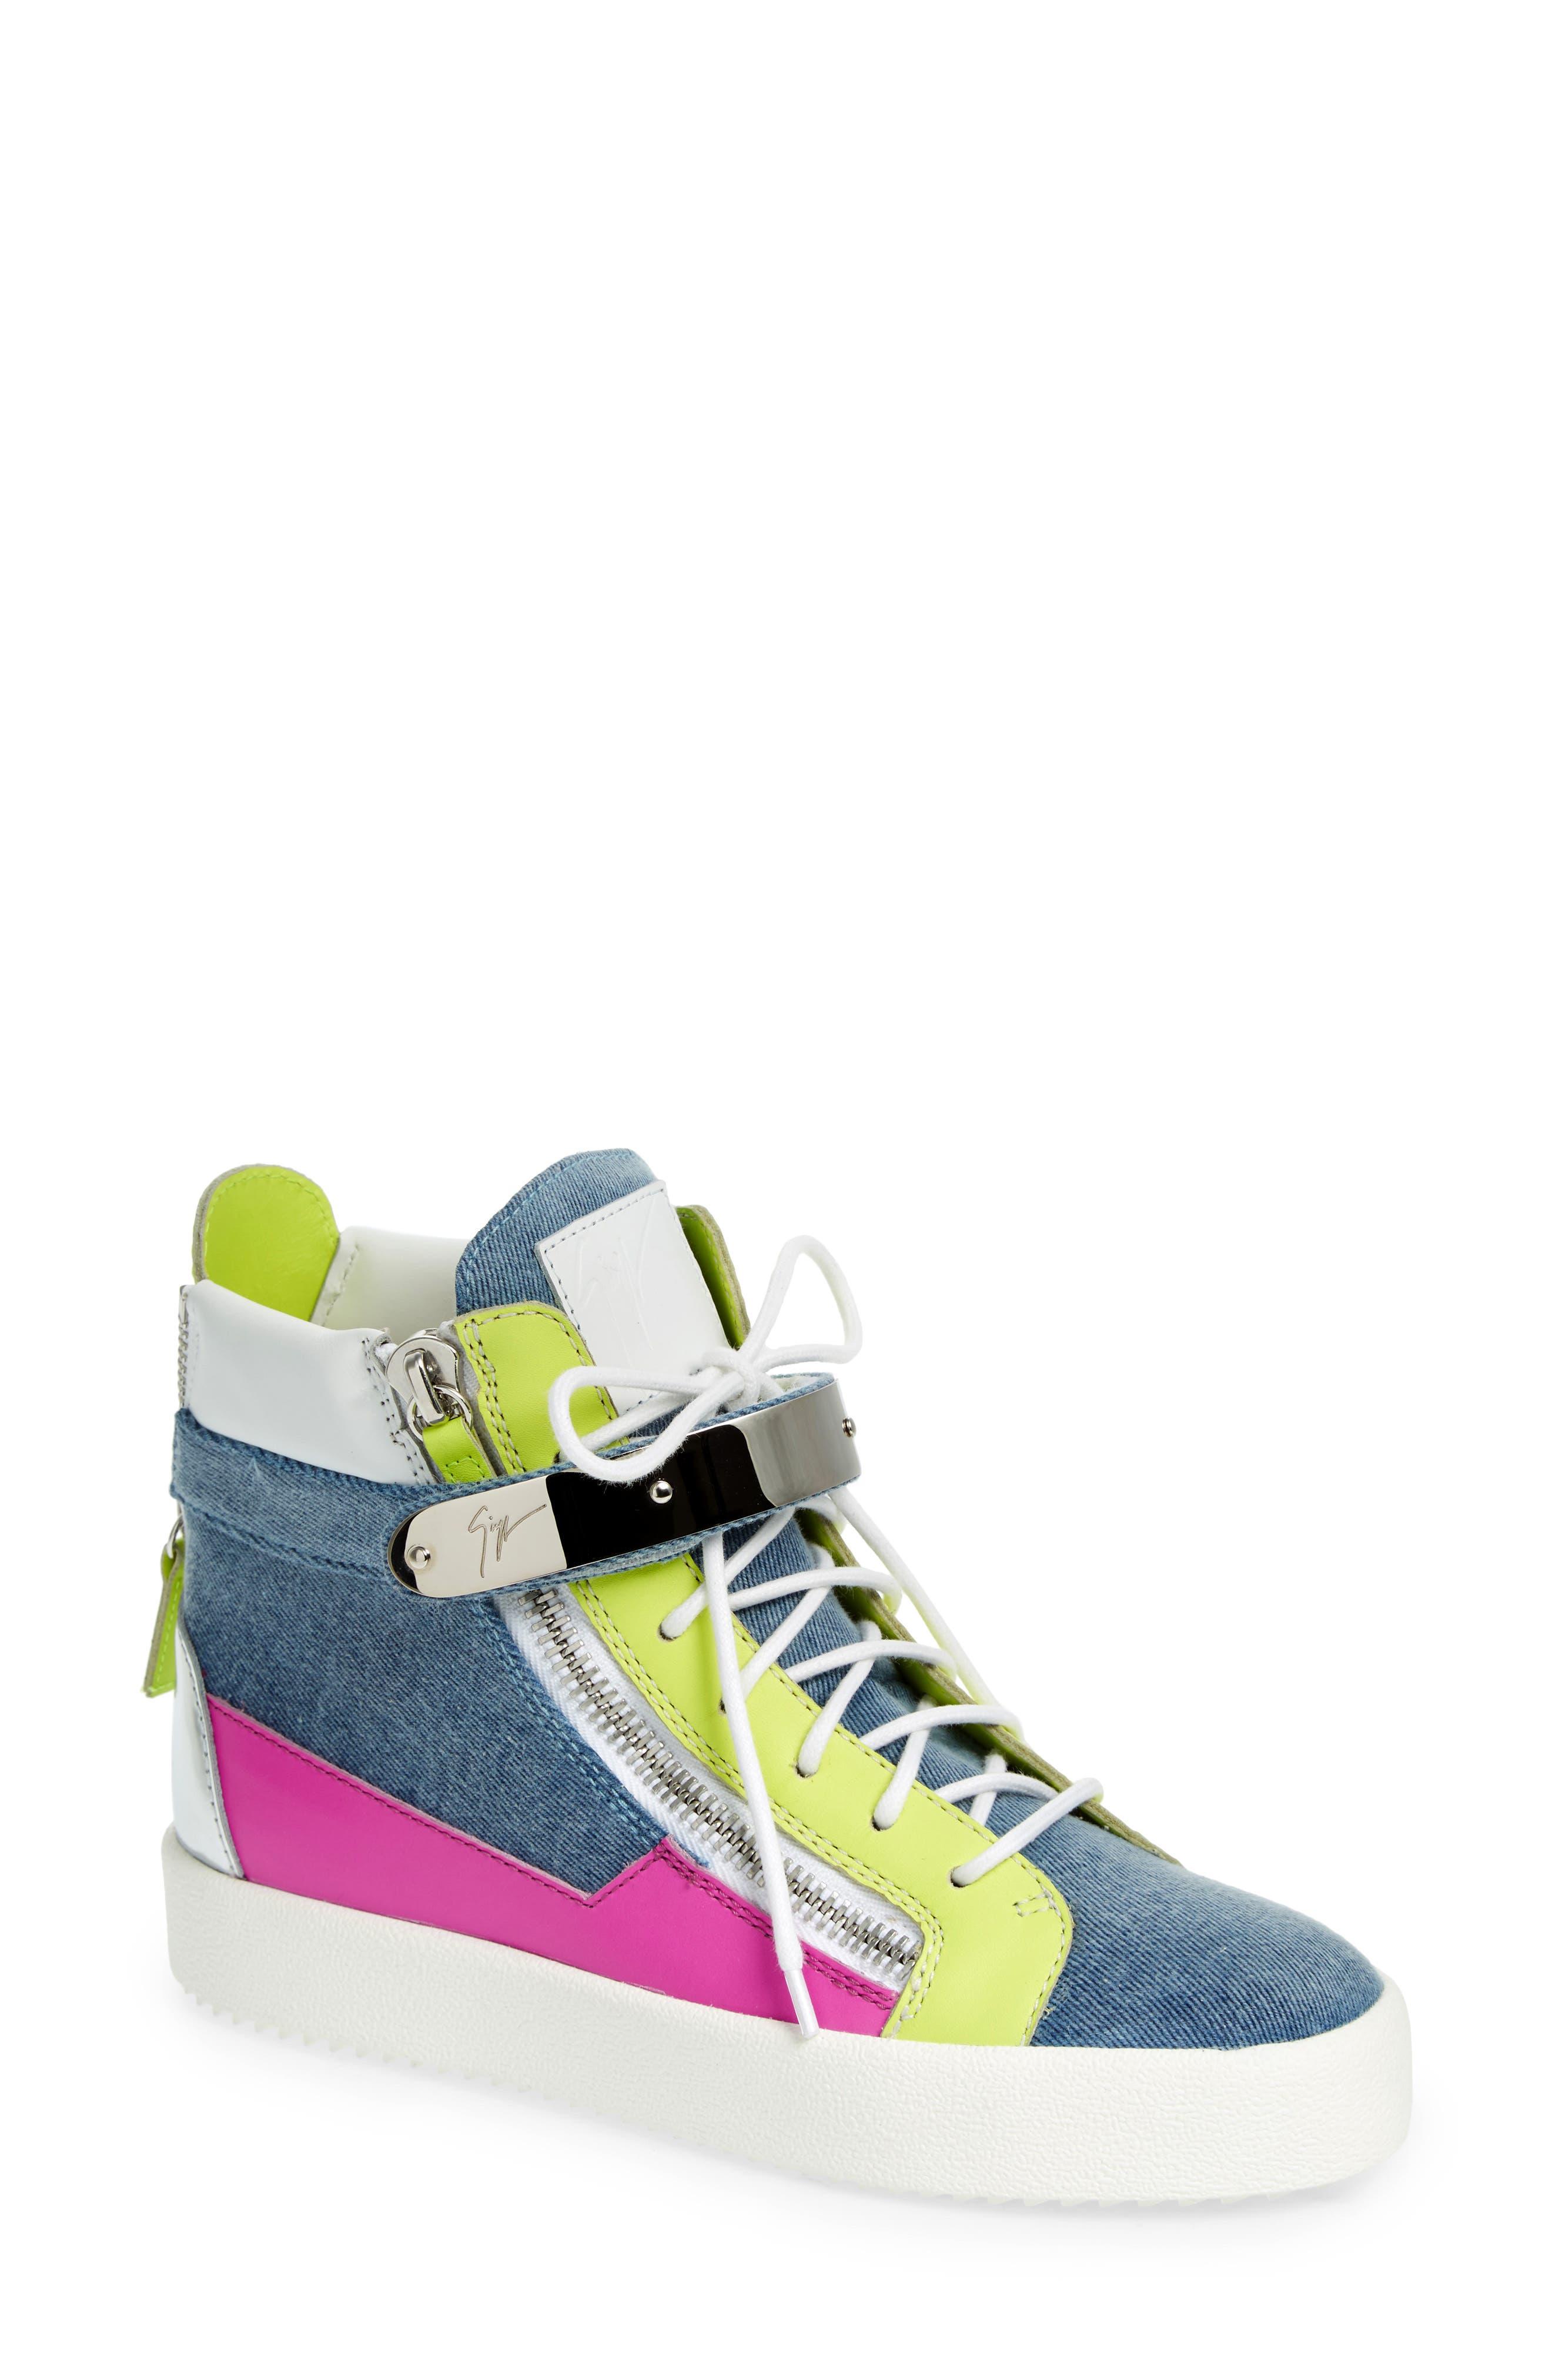 May London High Top Sneaker,                         Main,                         color, 400